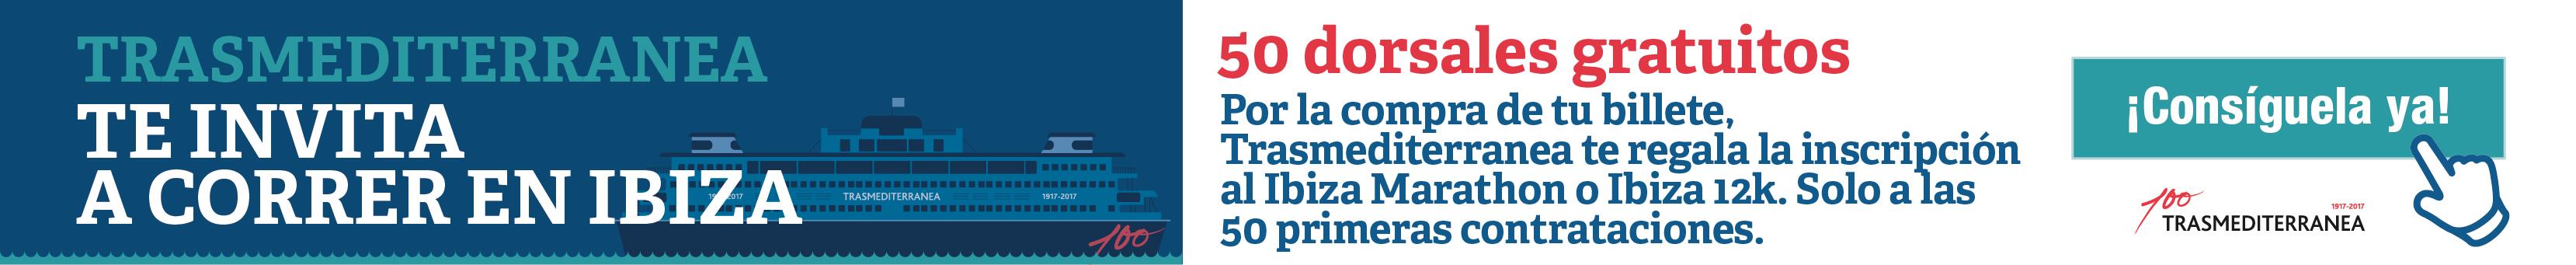 banner_paquetes_es.jpg